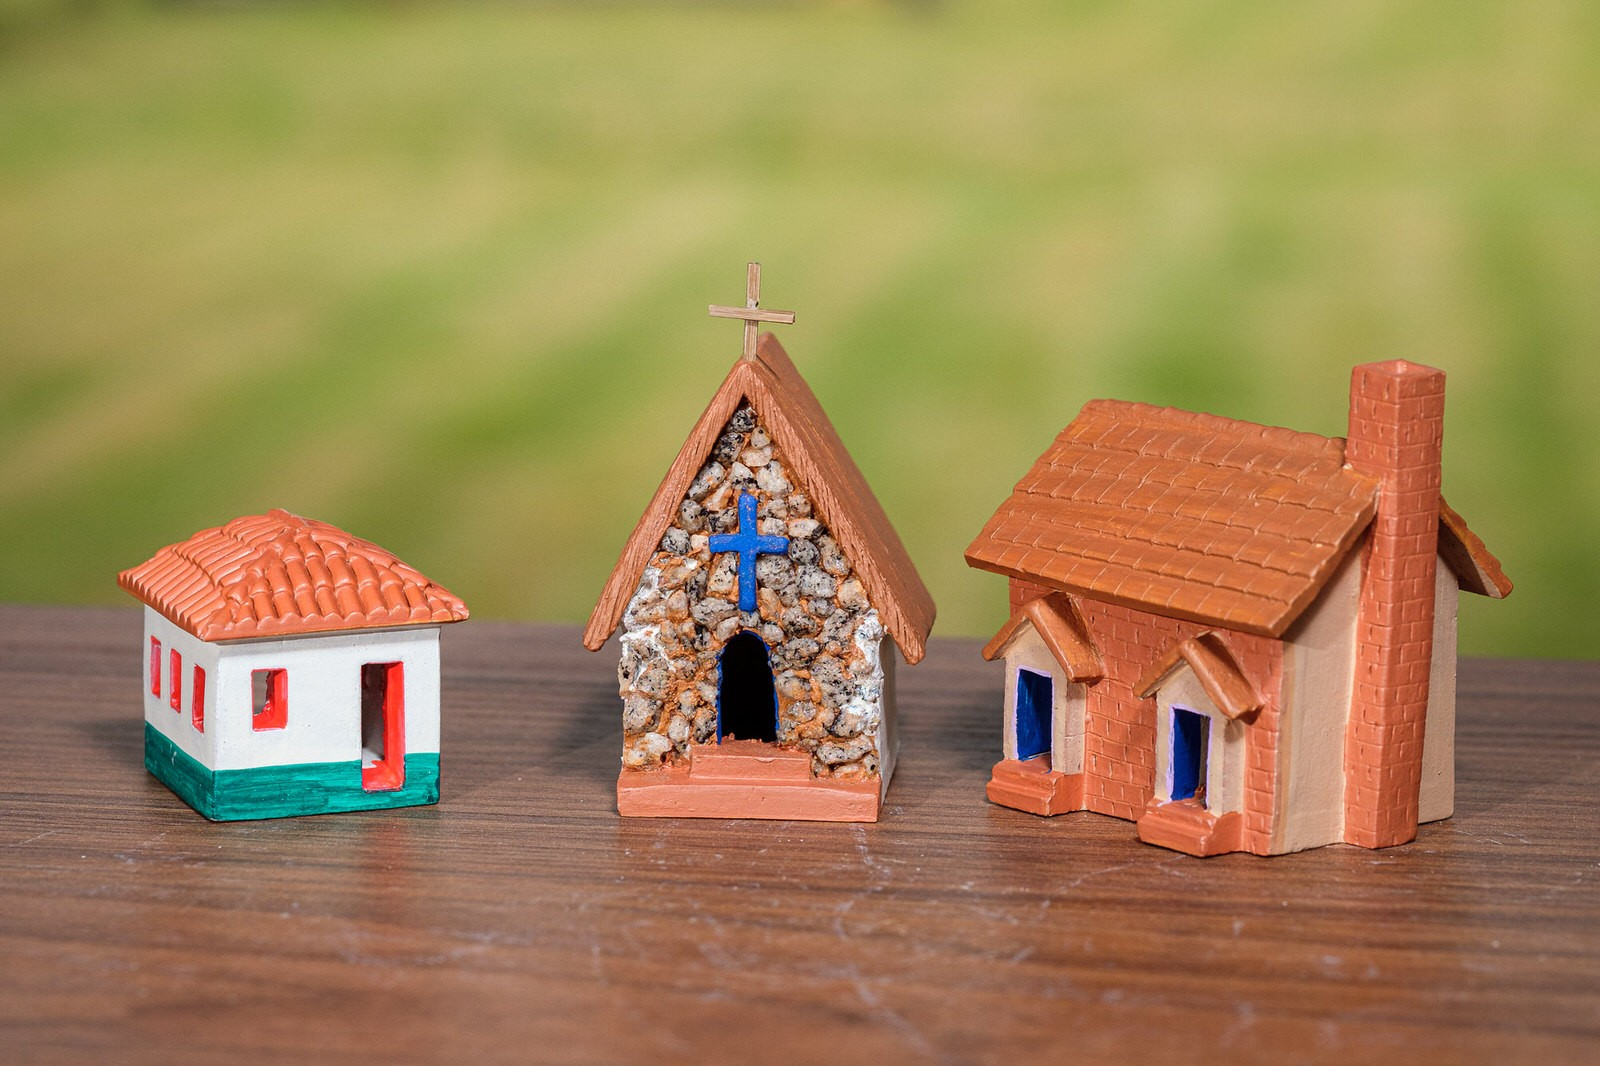 Kit Miniaturas em Barro III - Vale do Jequitinhonha